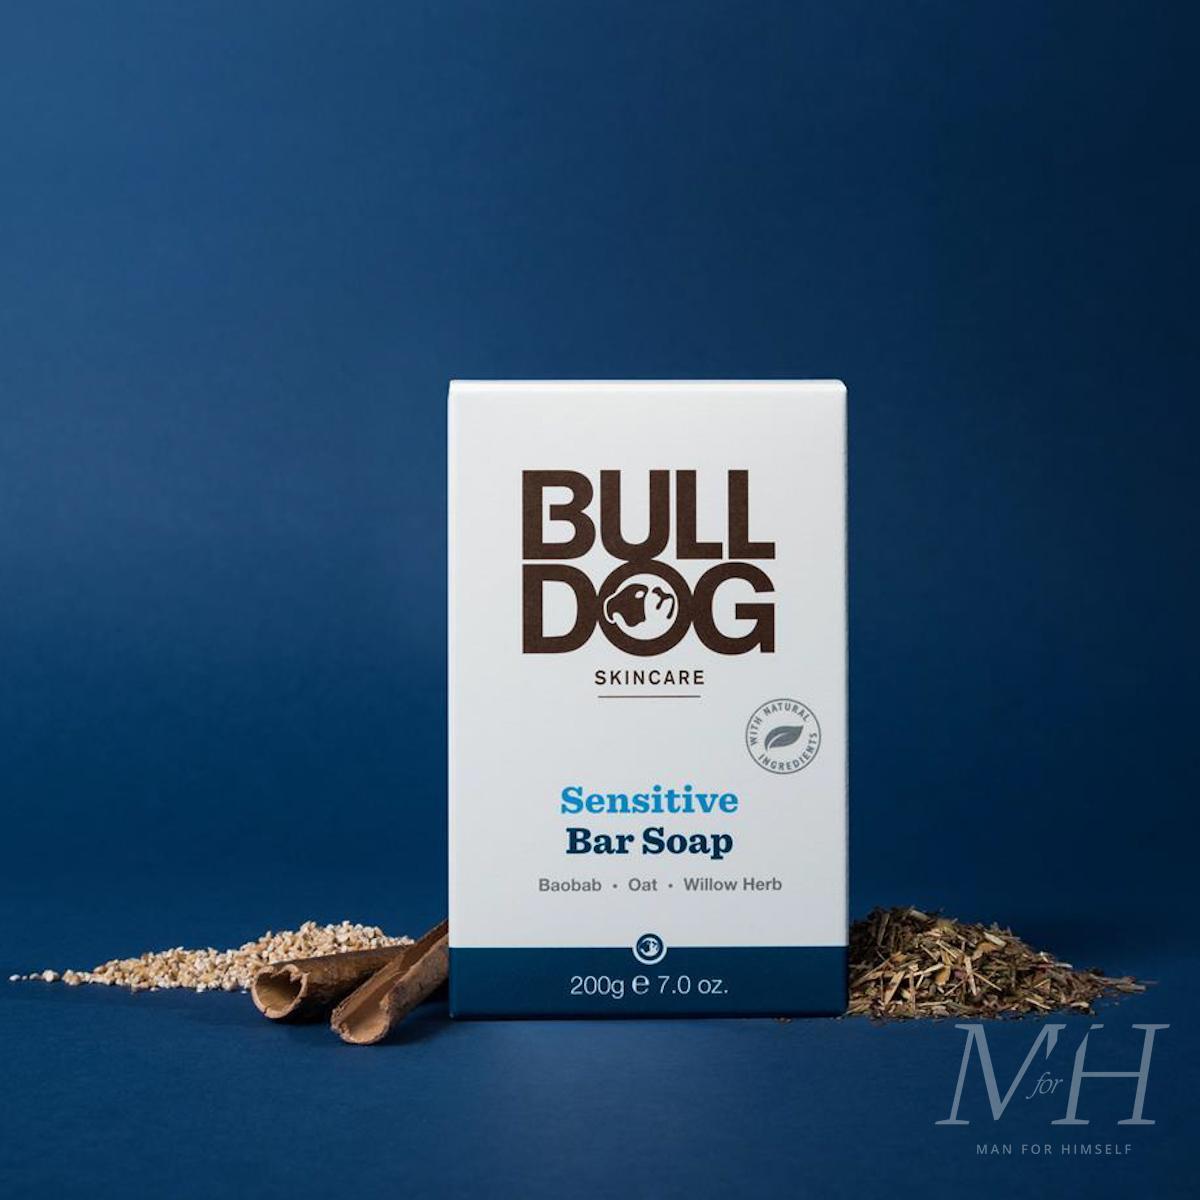 bulldog-skincare-bar-soap-sensitive-payday-pickups-man-for-himself